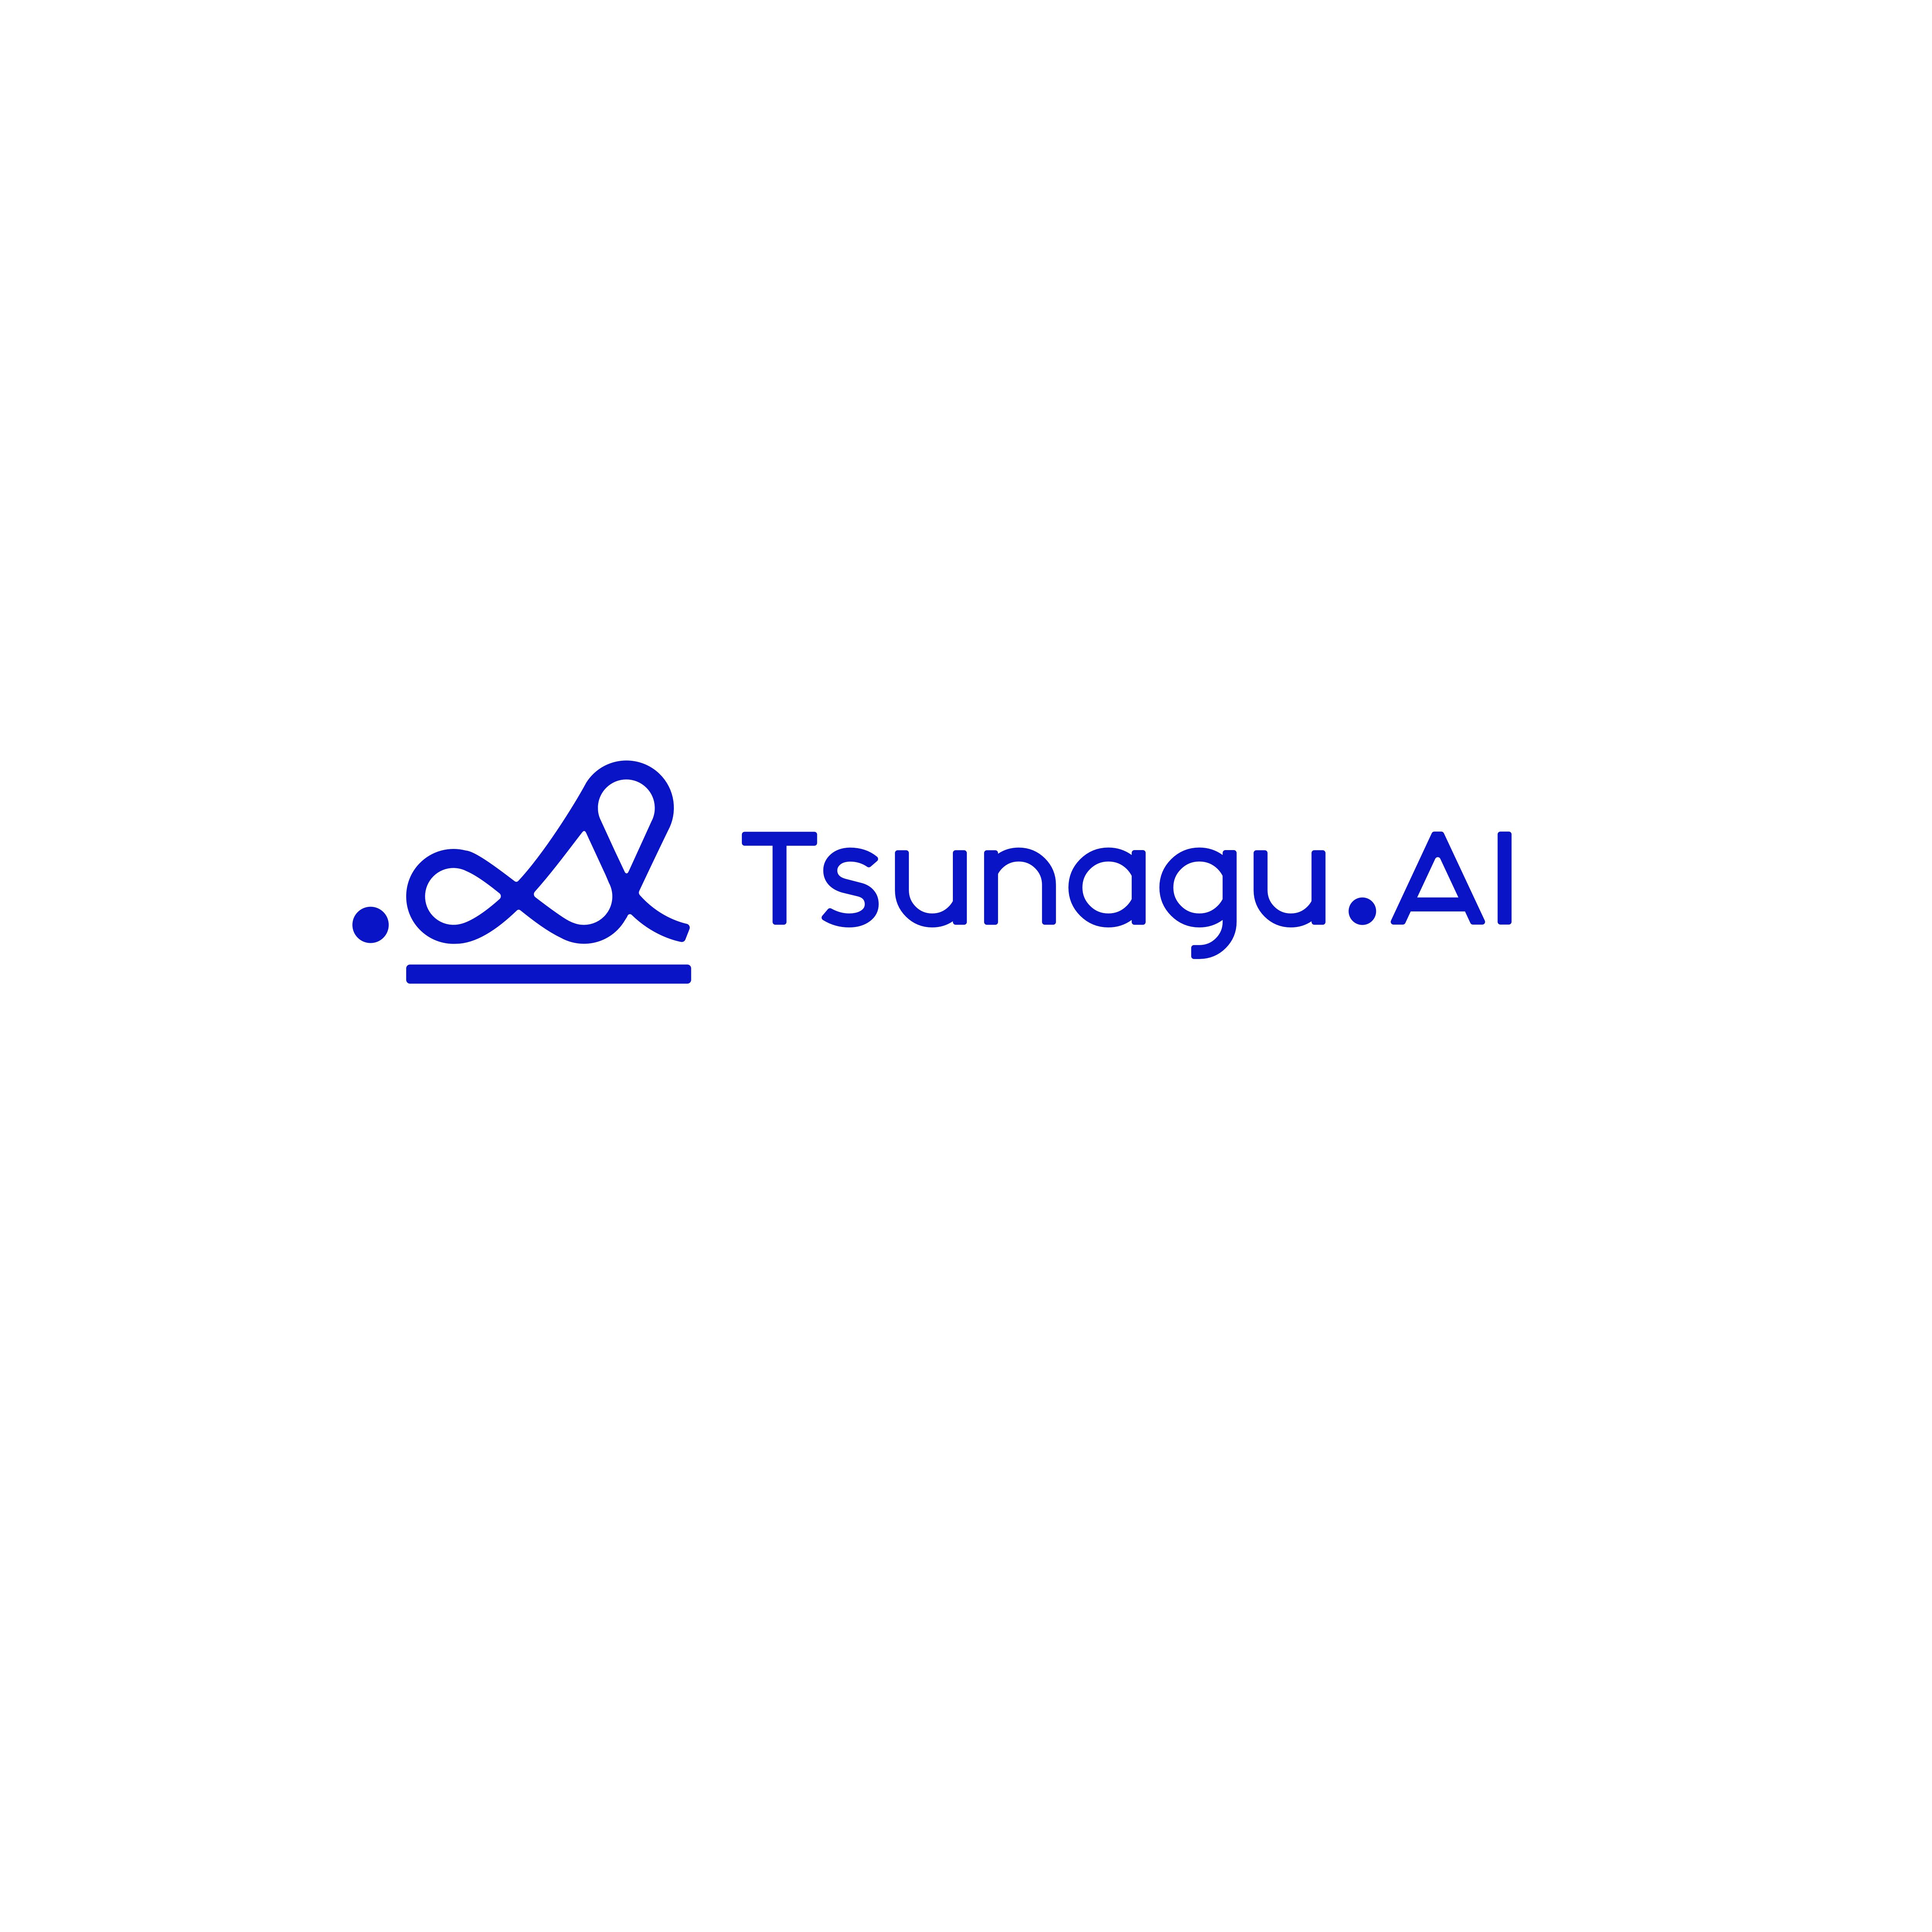 logo_blue2